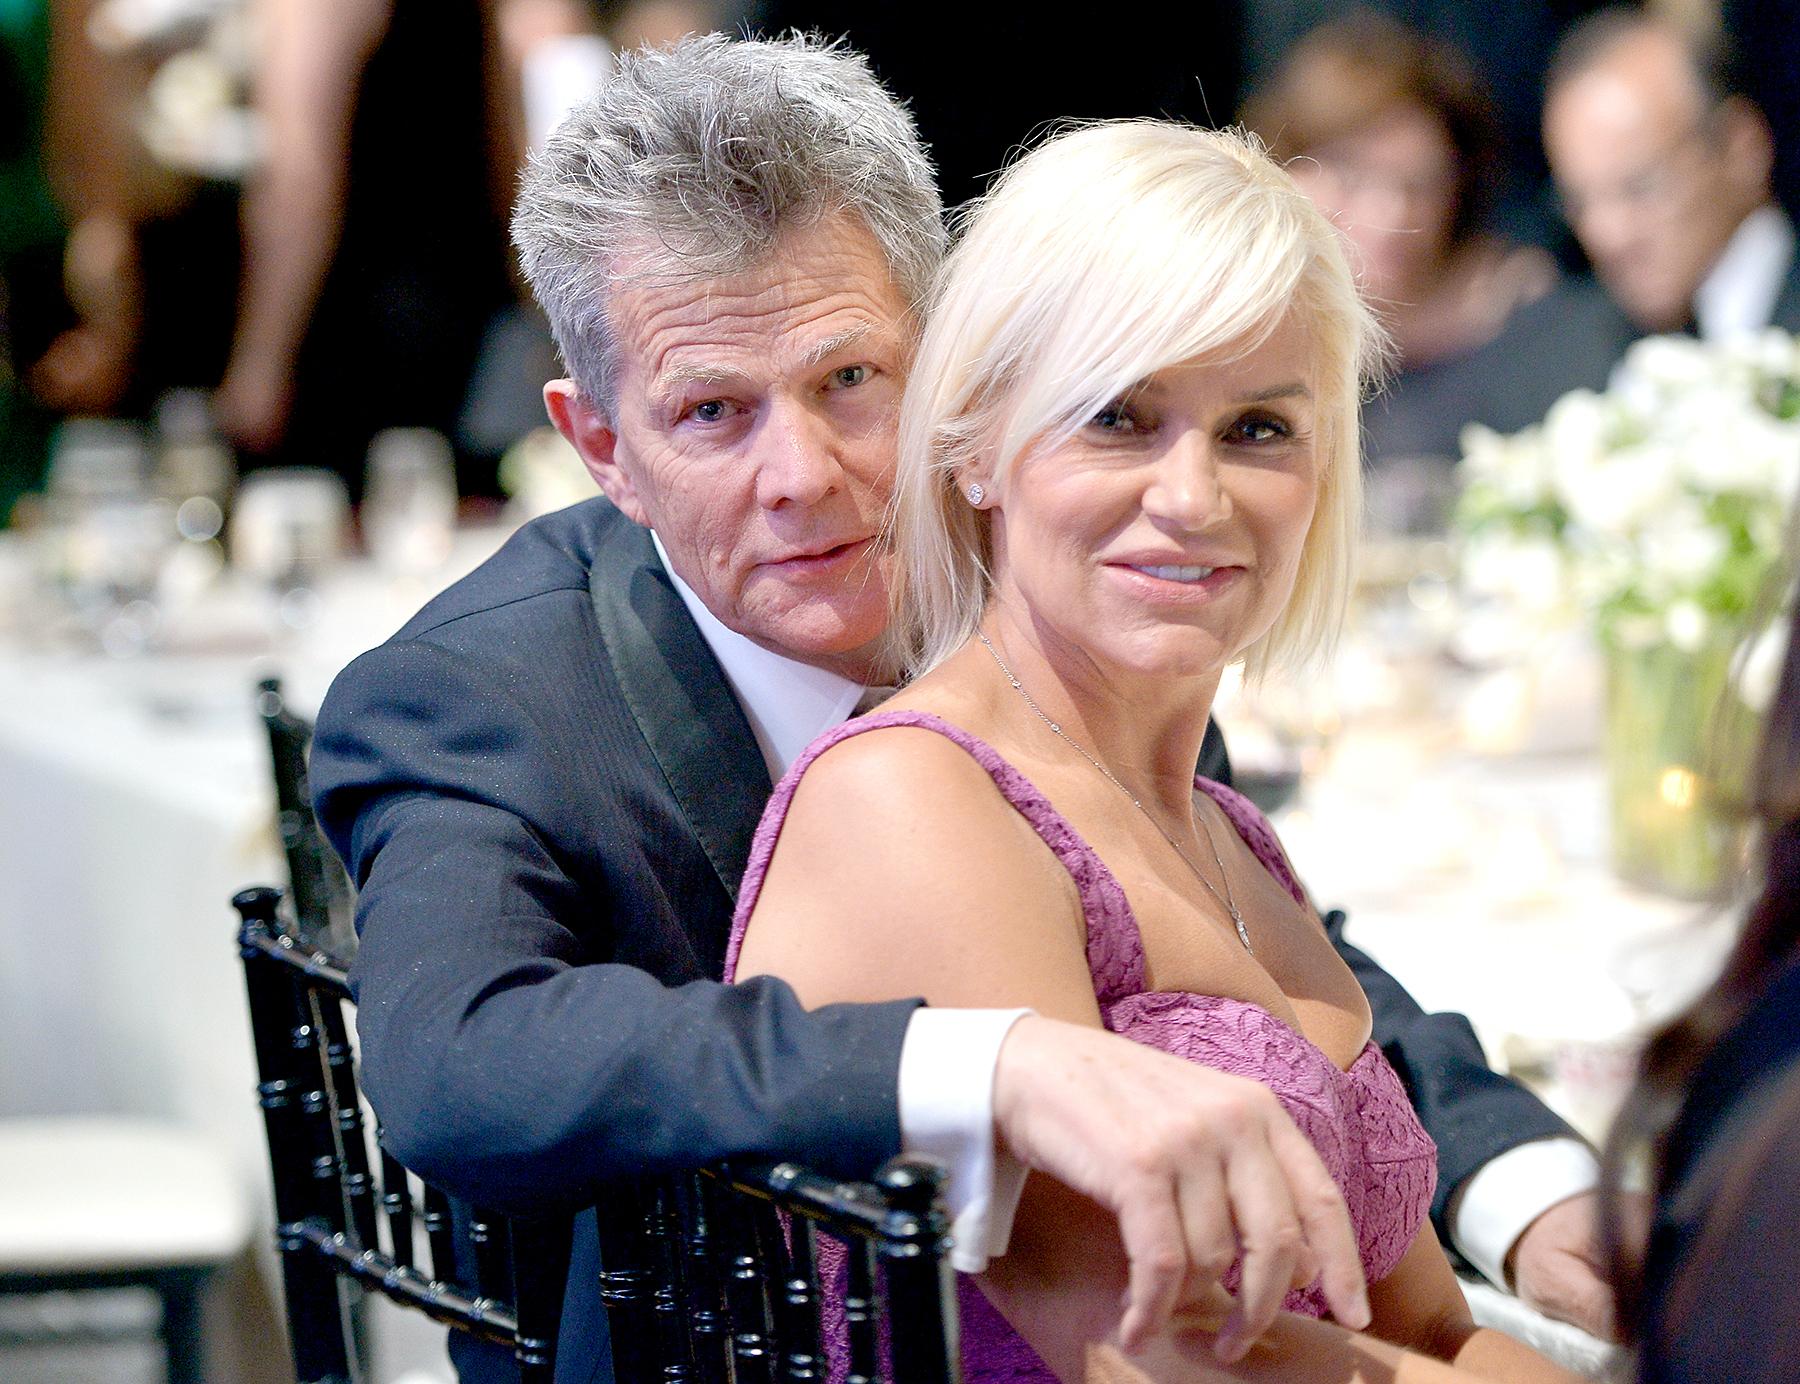 David Foster and Yolanda Foster attend Muhammad Ali's Celebrity Fight Night XX in 2014.